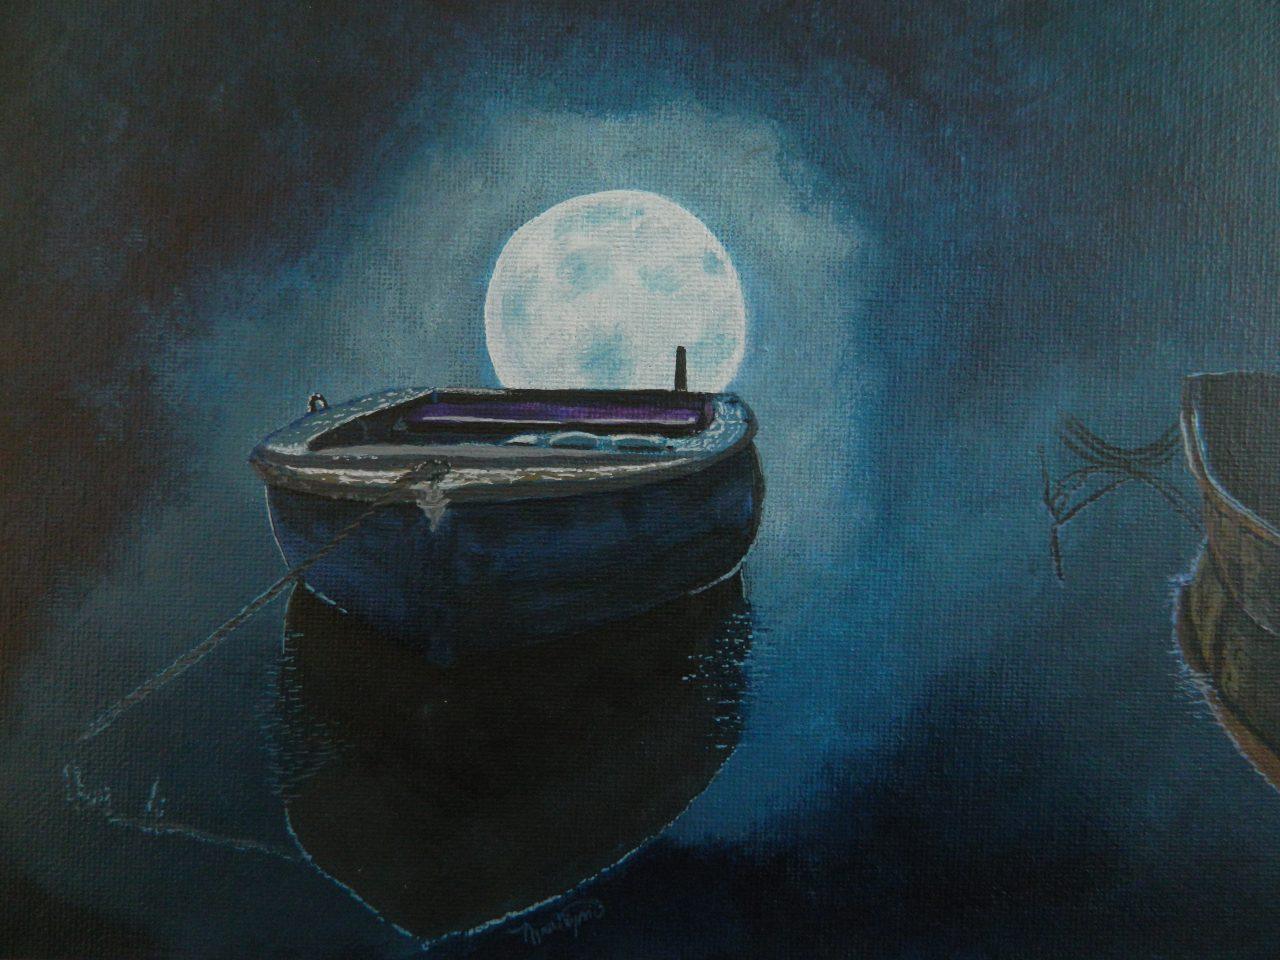 moon behind a boat